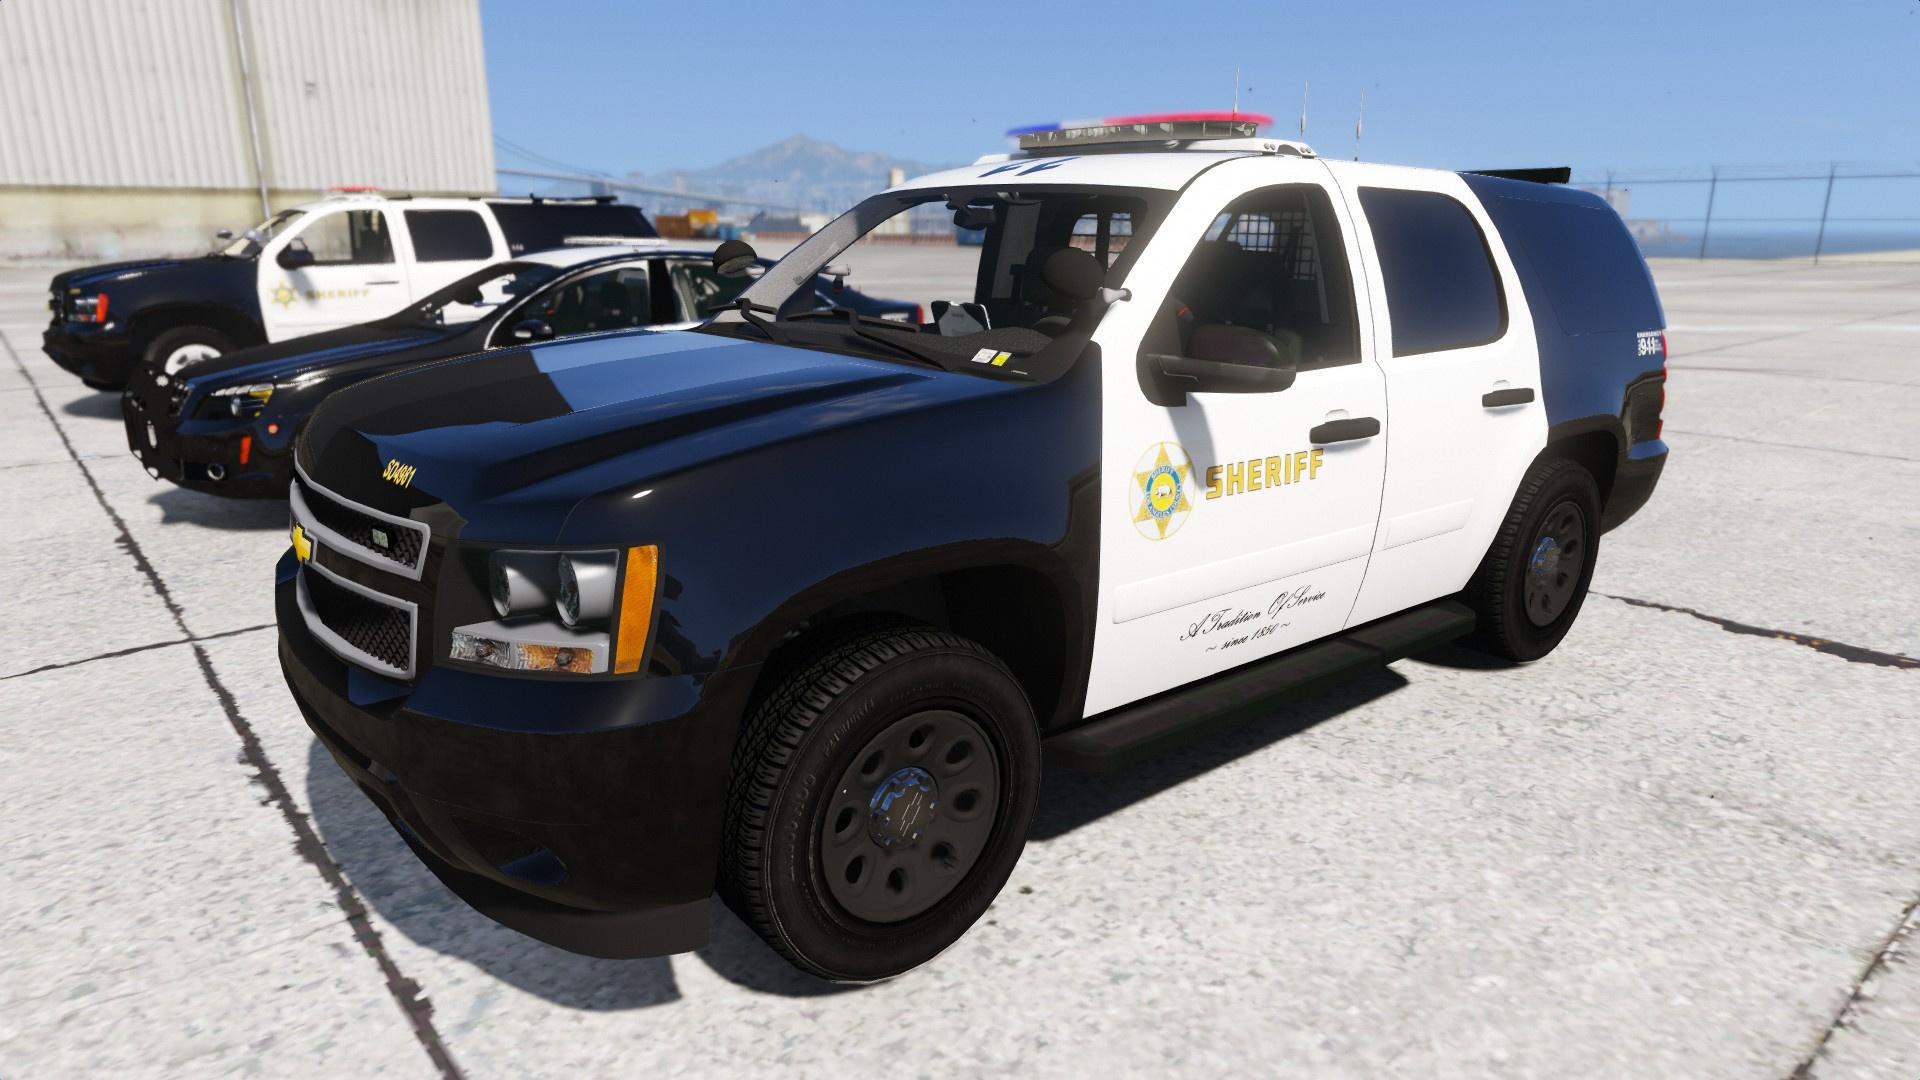 Chevrolet Suburban Lax Airport Police For Gta San Andreas: California Mega Pack